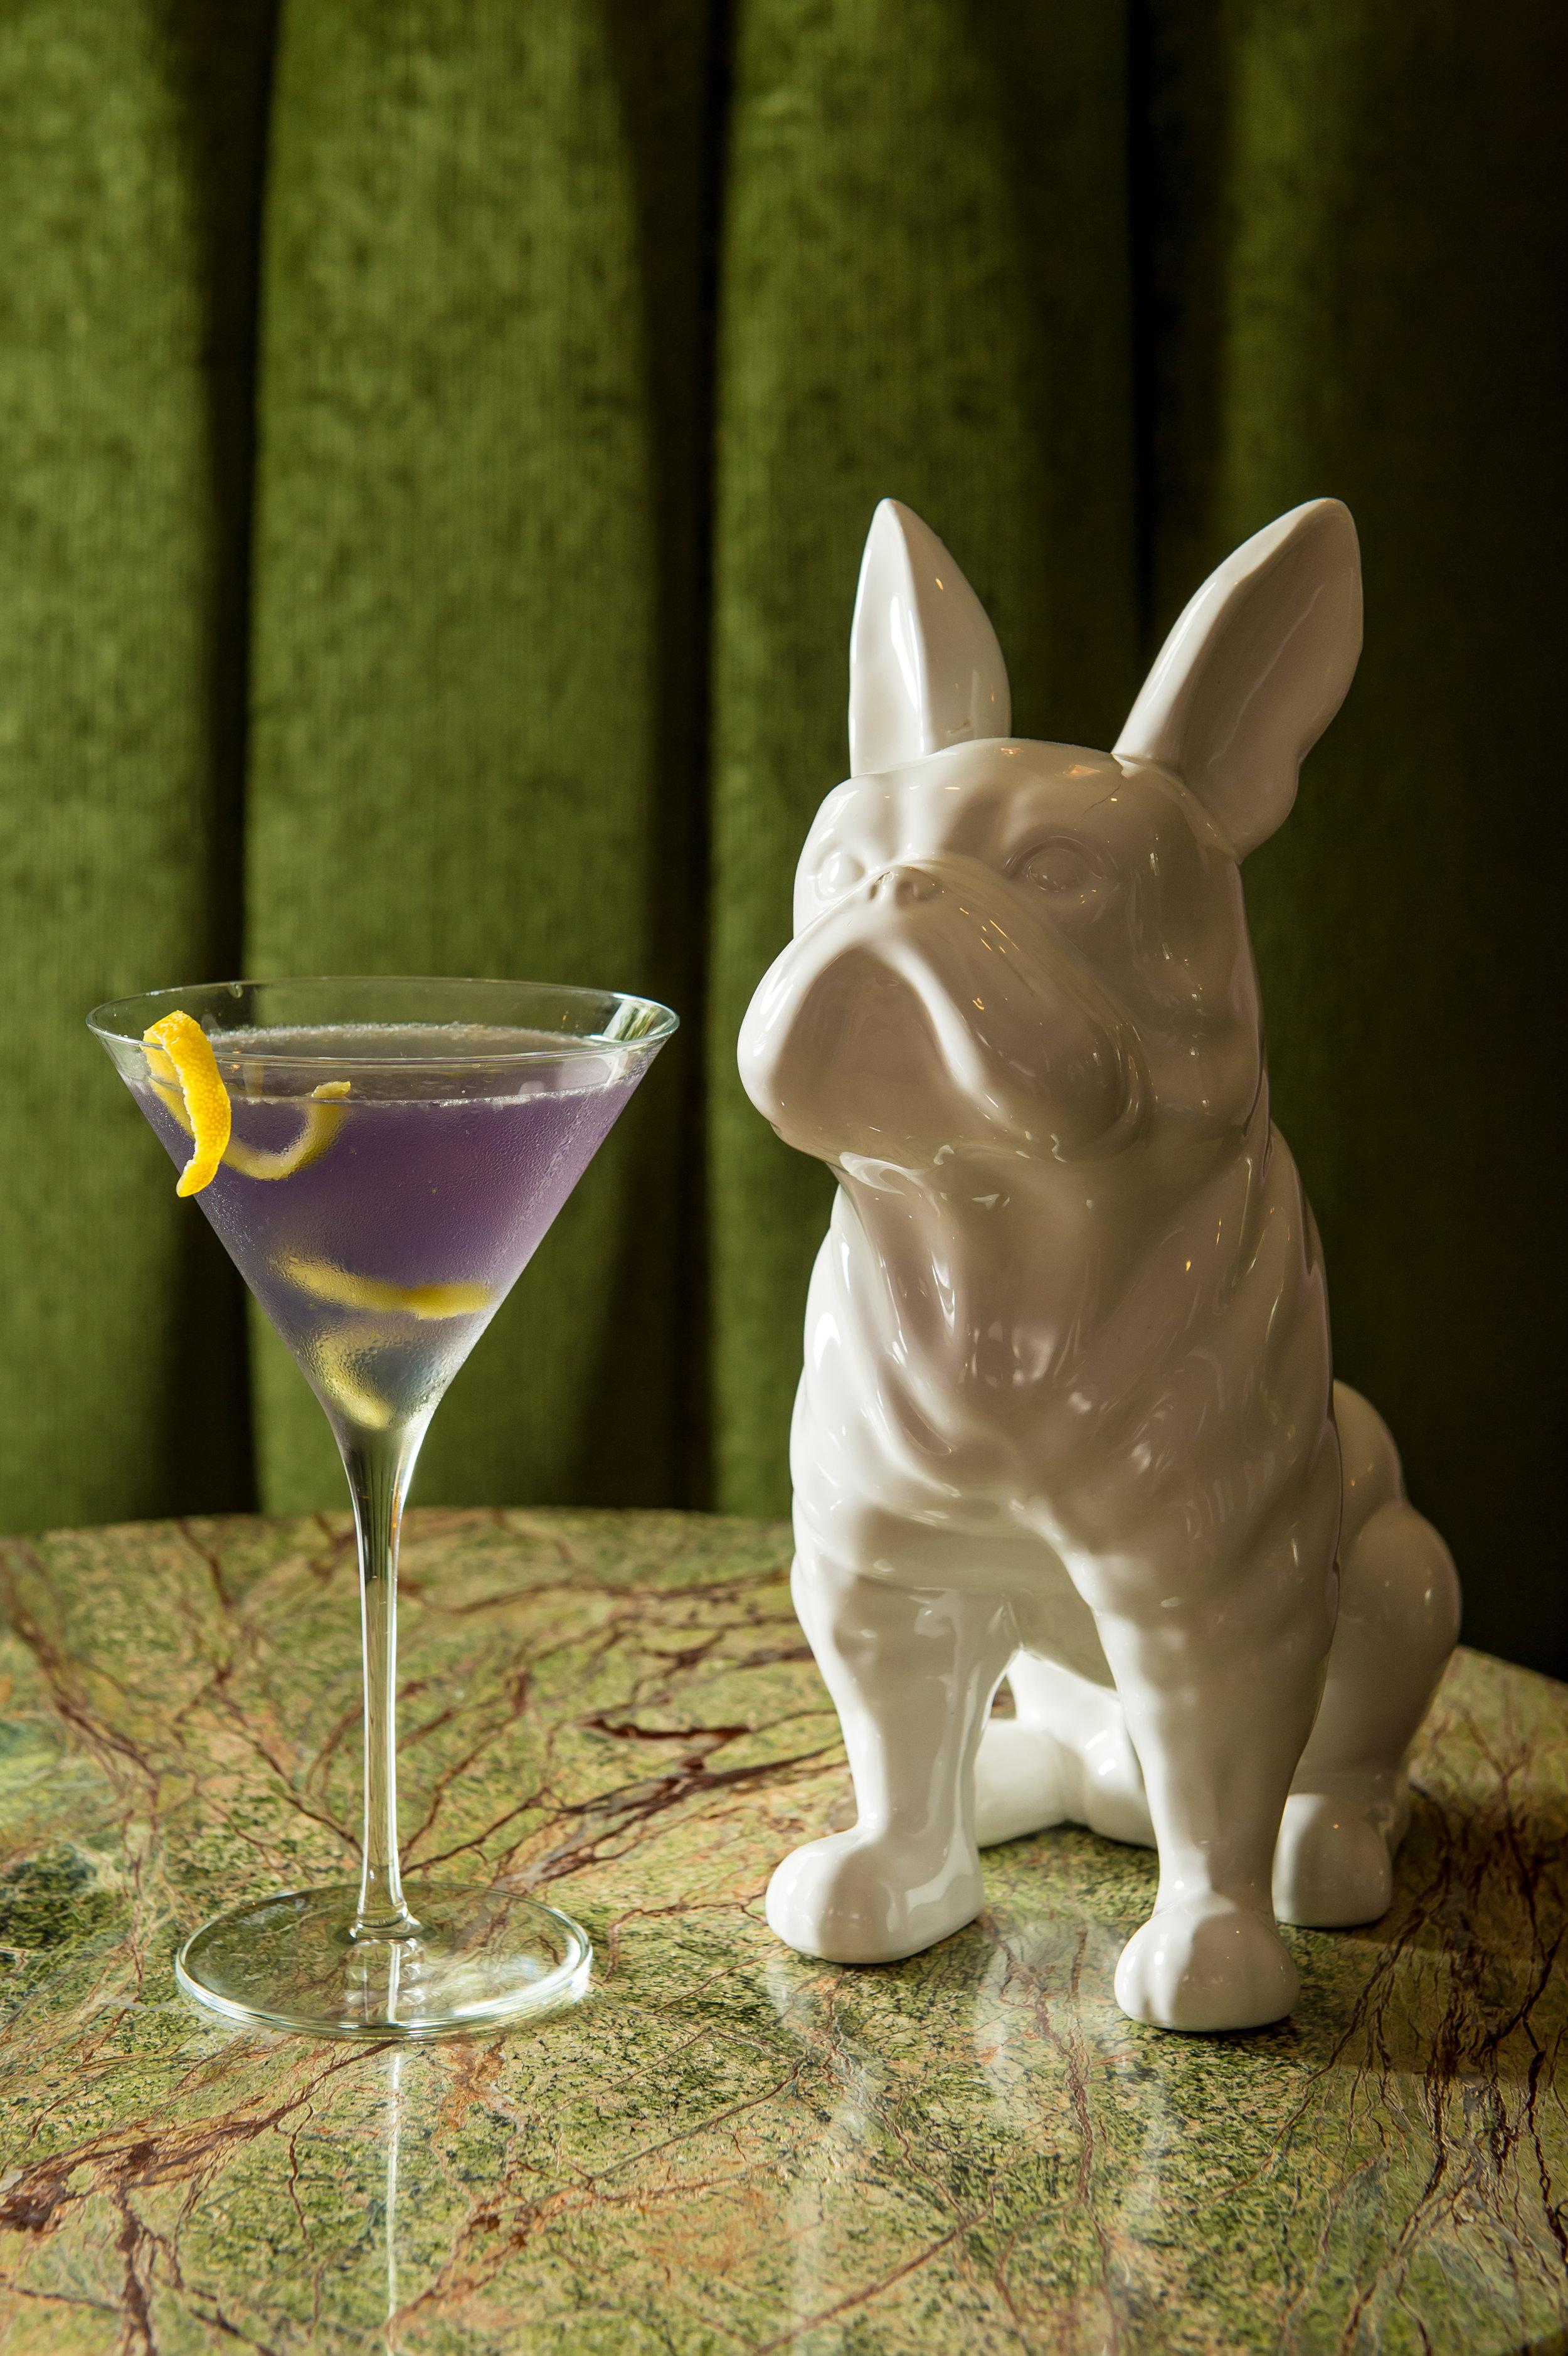 Aviation - bombay sapphire gin, luxardo maraschino liqueur, creme de violette, lemon